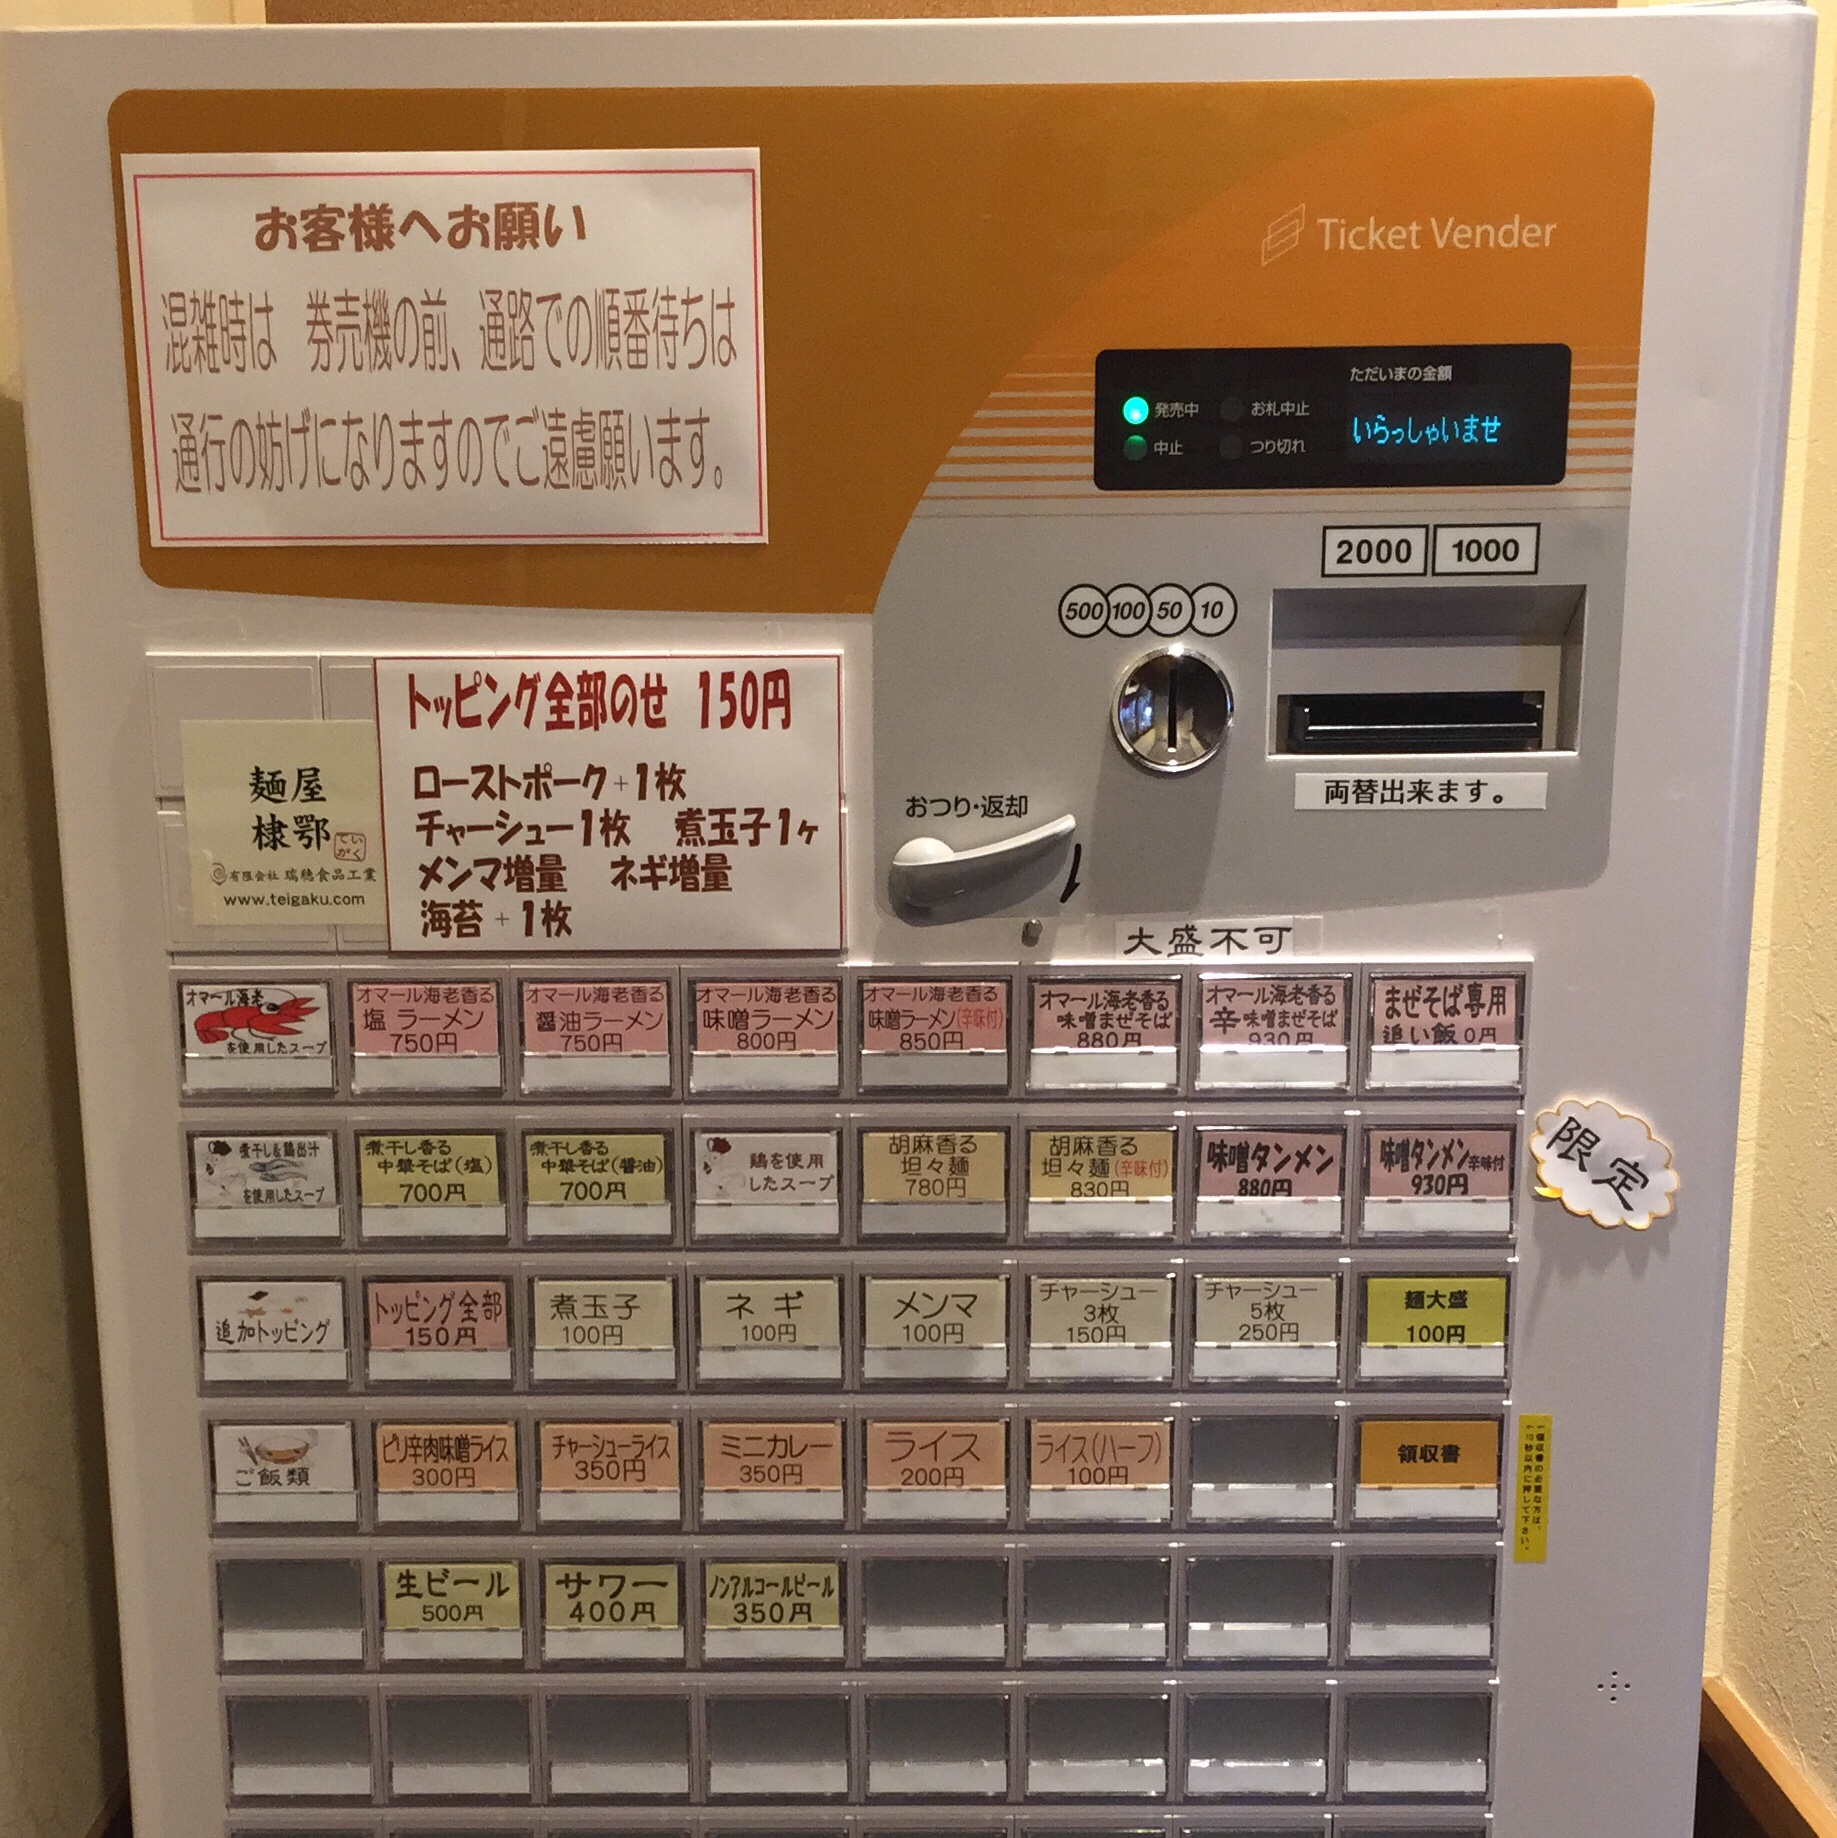 NOODLE SHOP KOUMITEI(香味亭) 券売機 メニュー